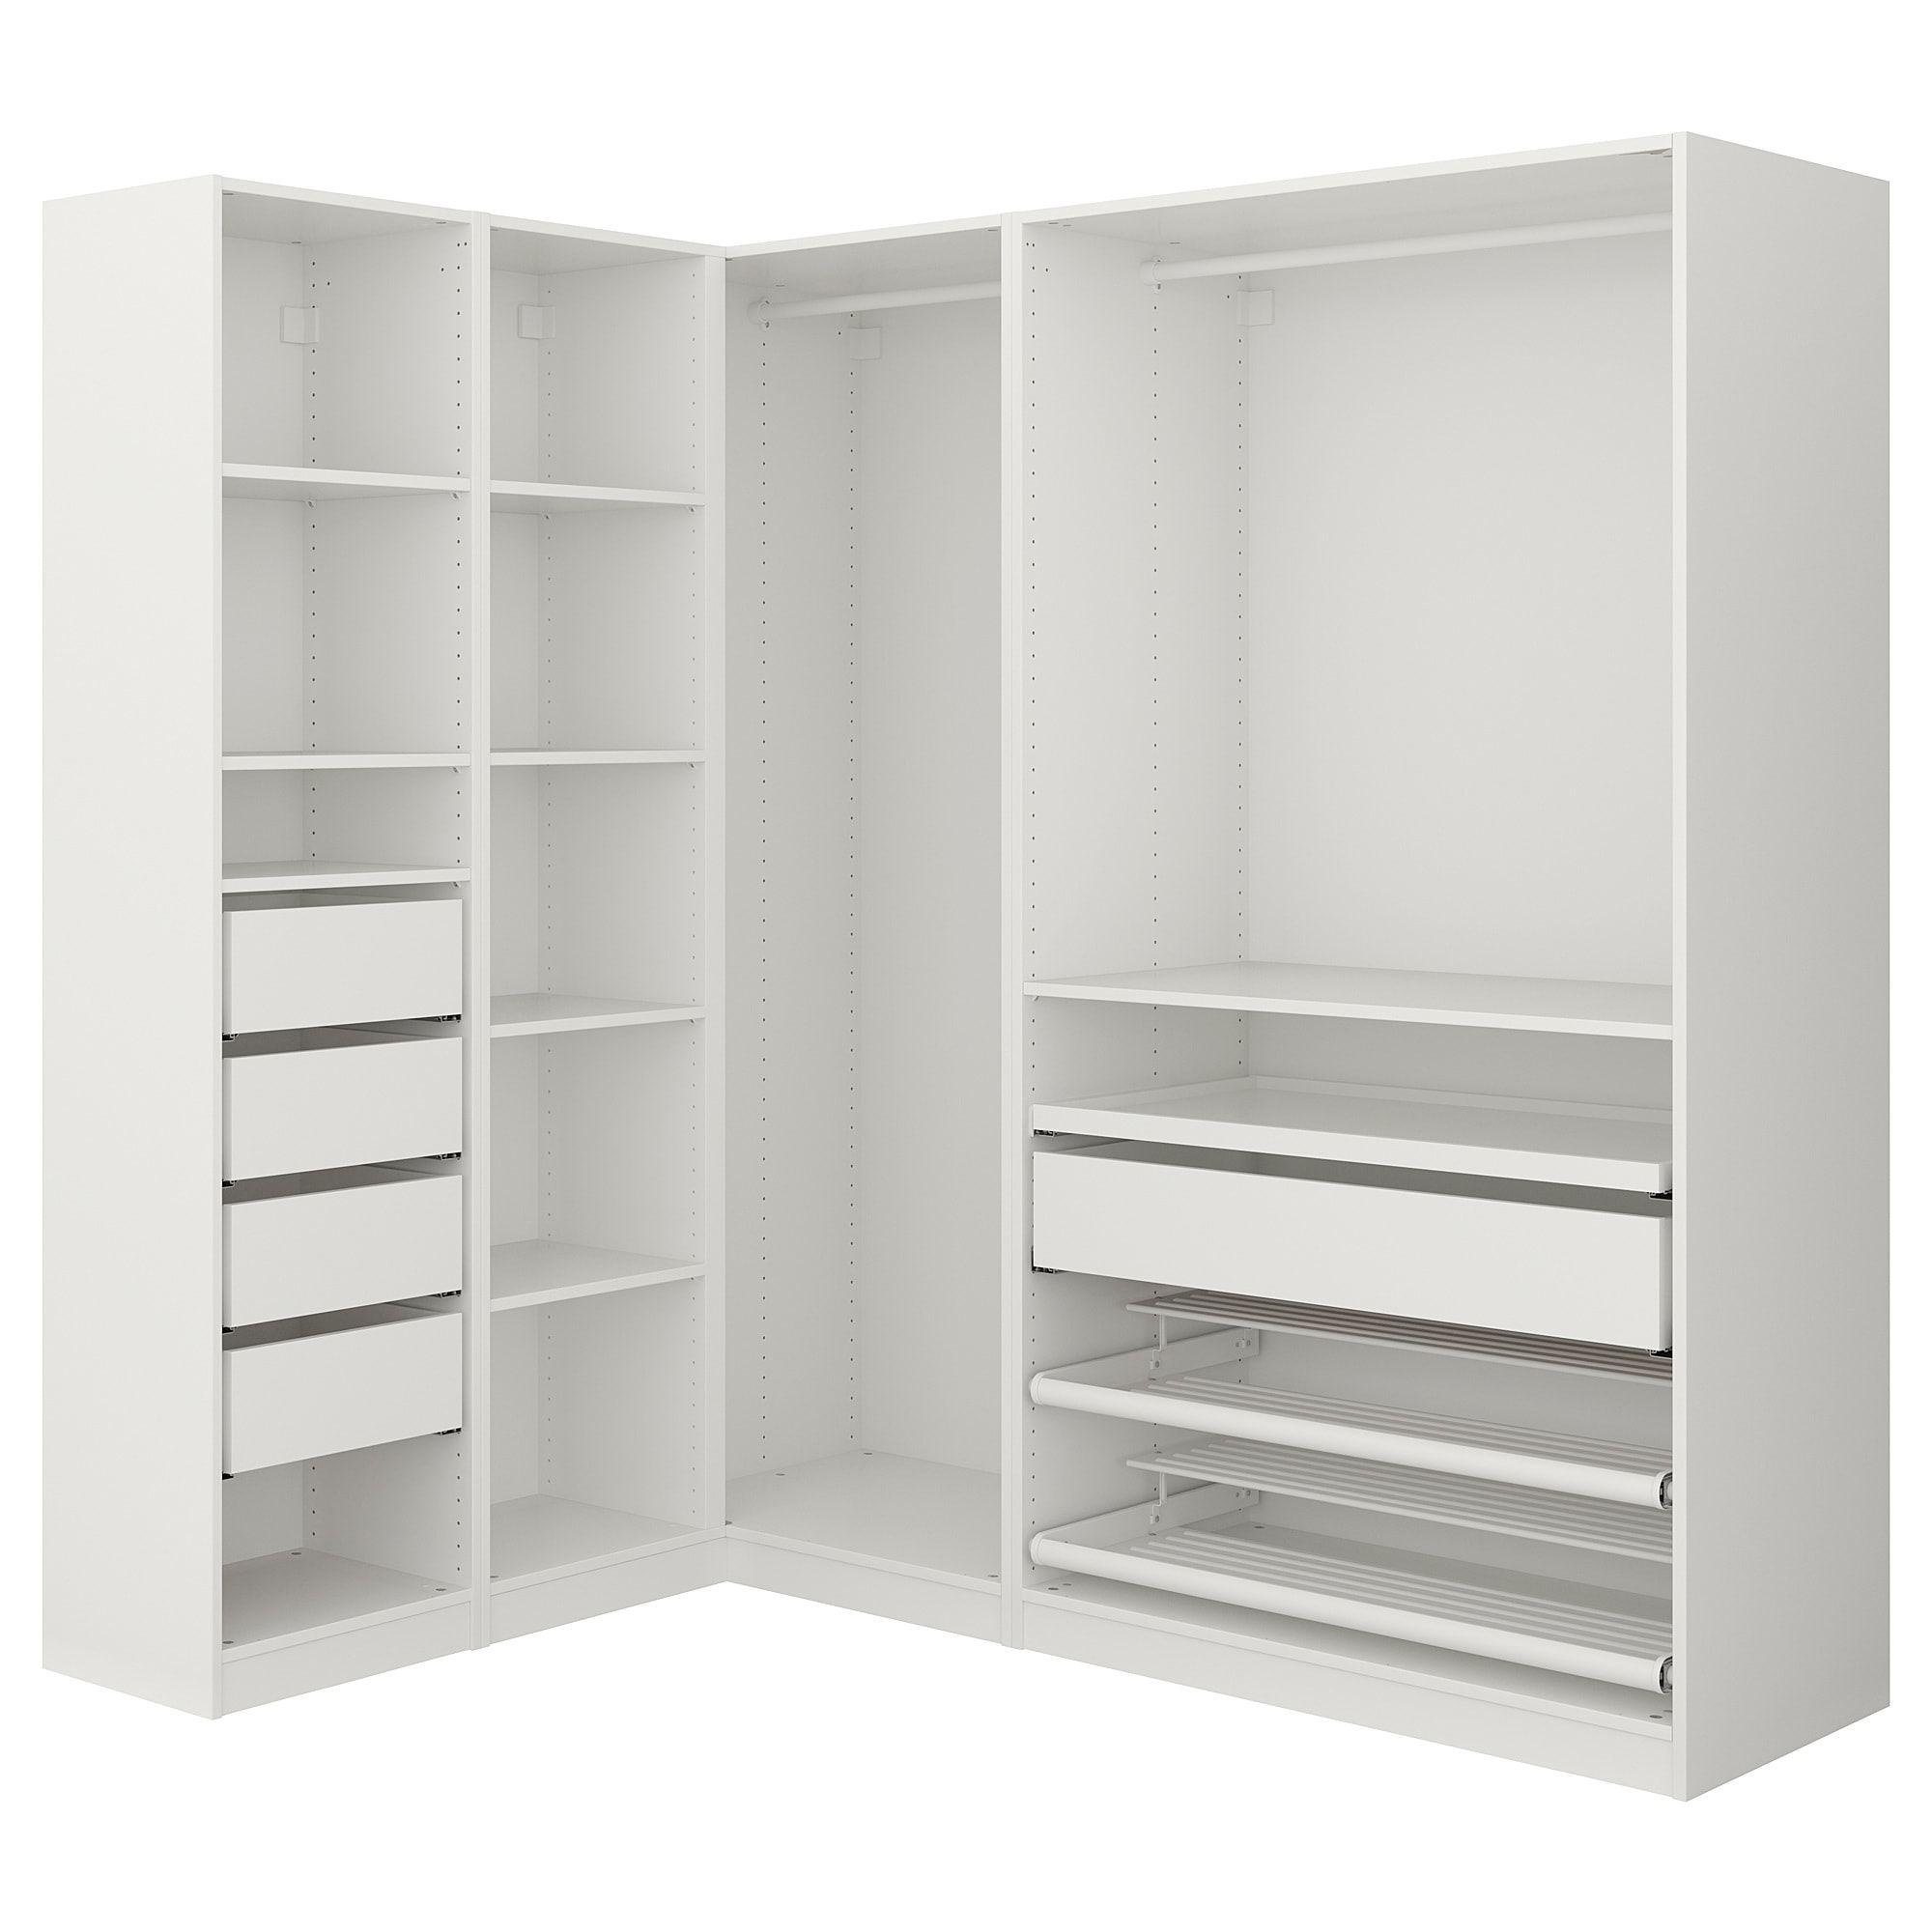 "PAX Corner wardrobe white 63 1/8/73 7/8x79 1/4 "" (160"